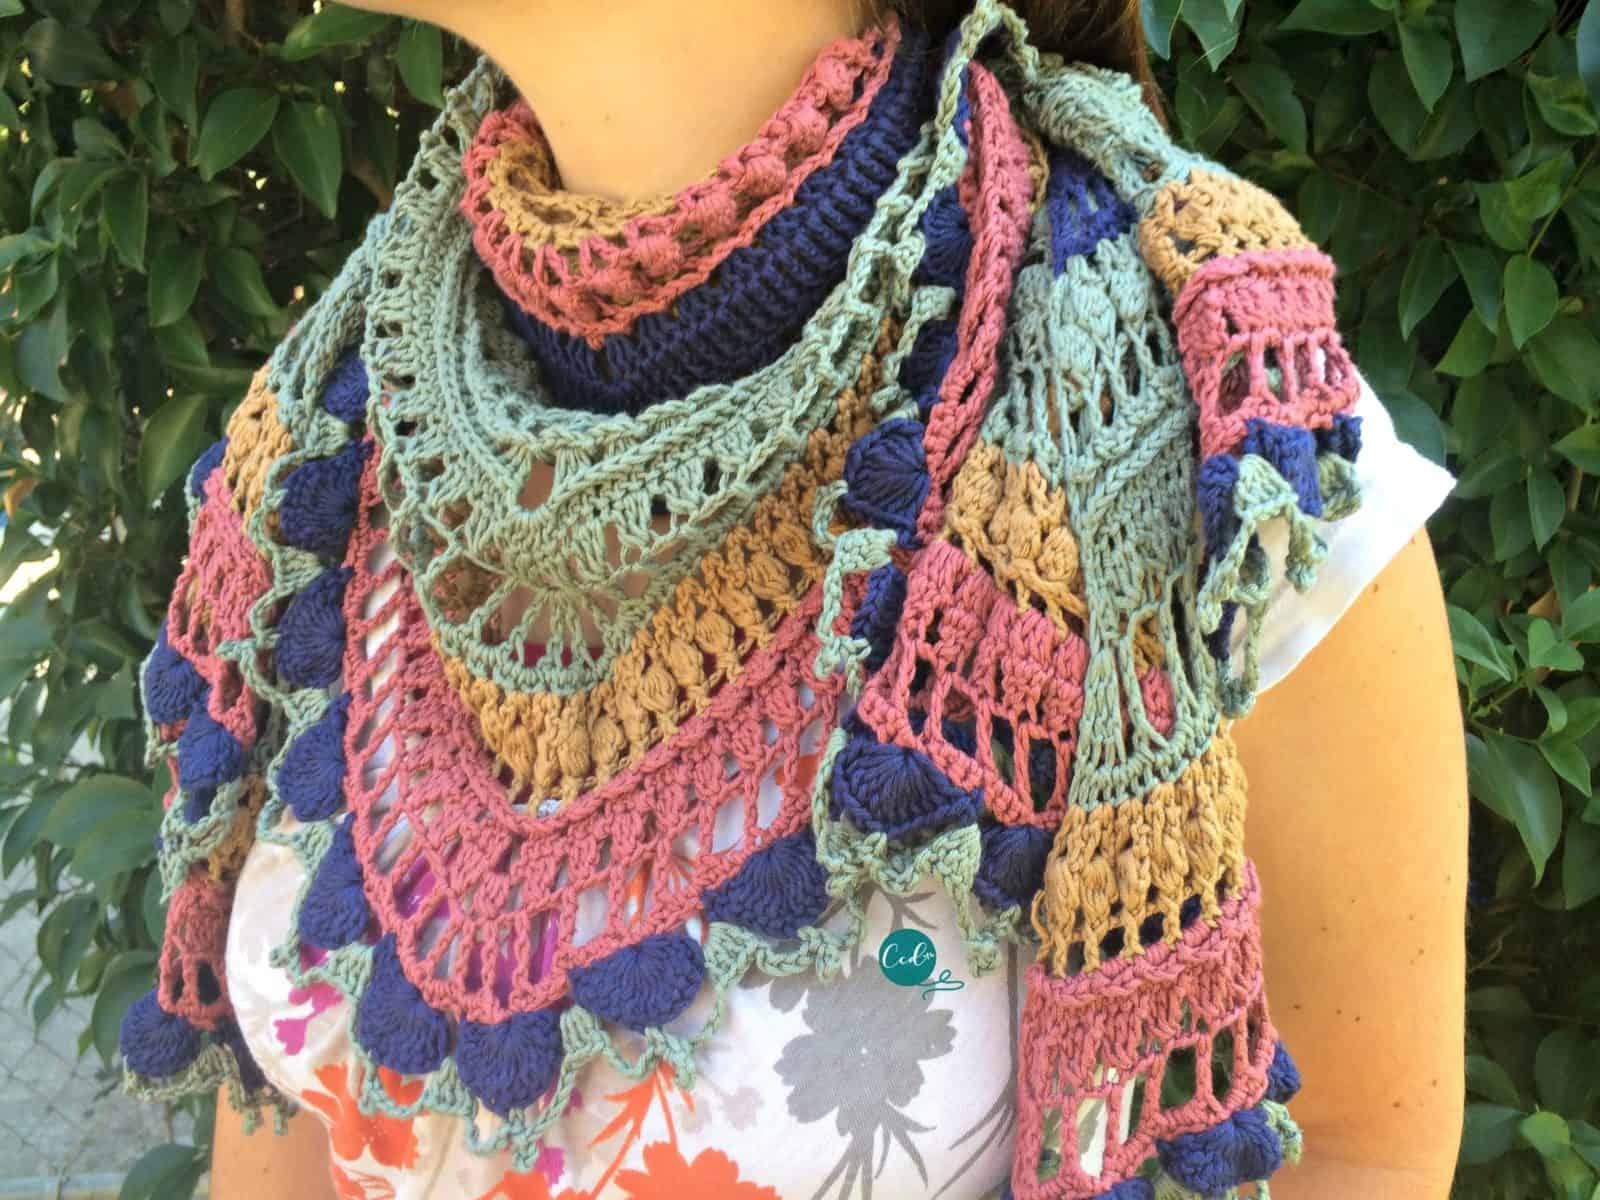 Crochet shawlette draped on woman's neck like triangle scarf.